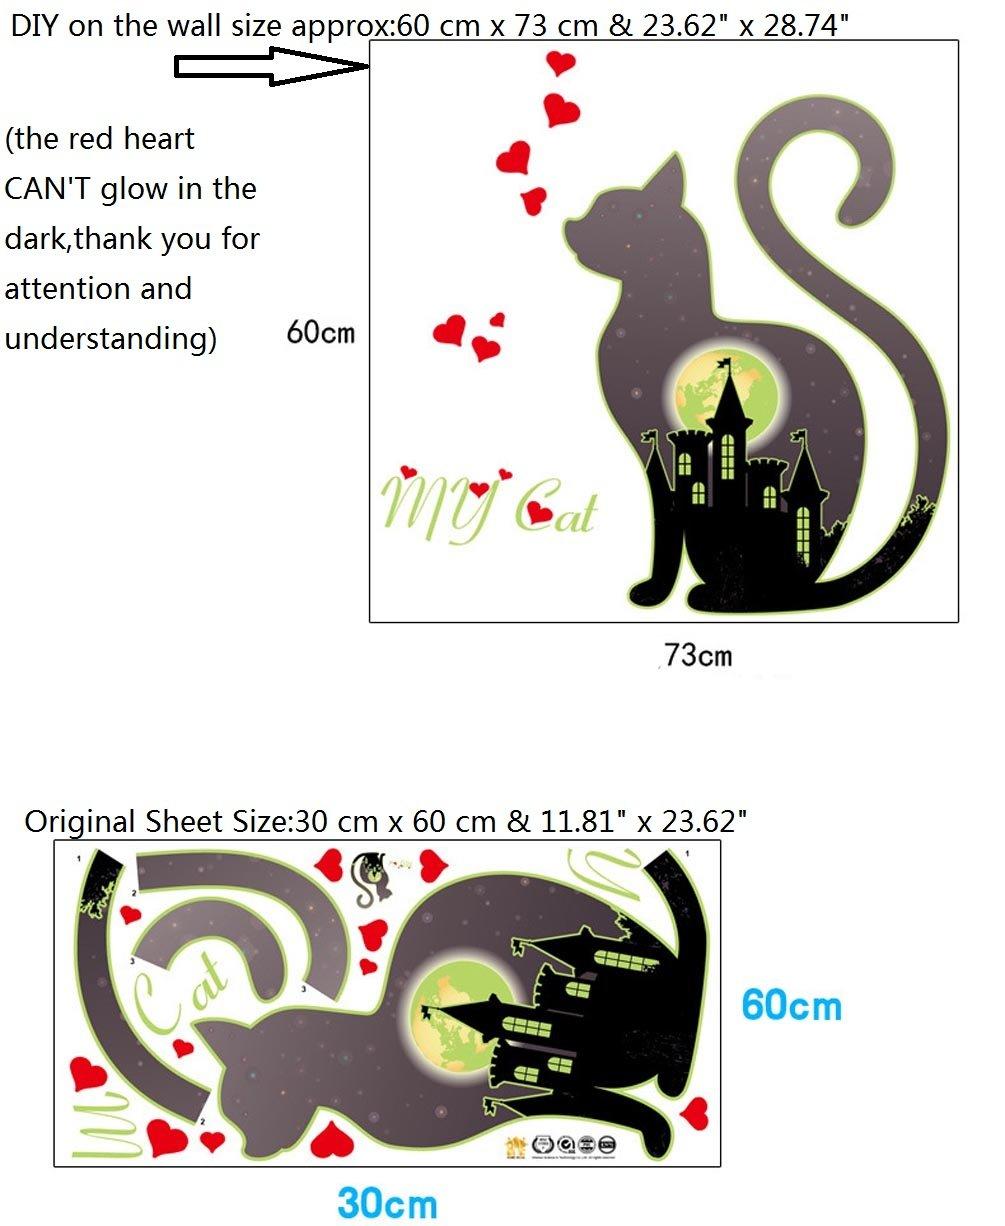 BIBITIME DIY 3 Black Cats Palying with Birds Under Street Lamp Wall Decal Nursery Bedroom Living Room Porch Back Door Office Shop Window Sticker Vinyl Art Mural for Kids Room Decor 31.49 x 31.49 2629